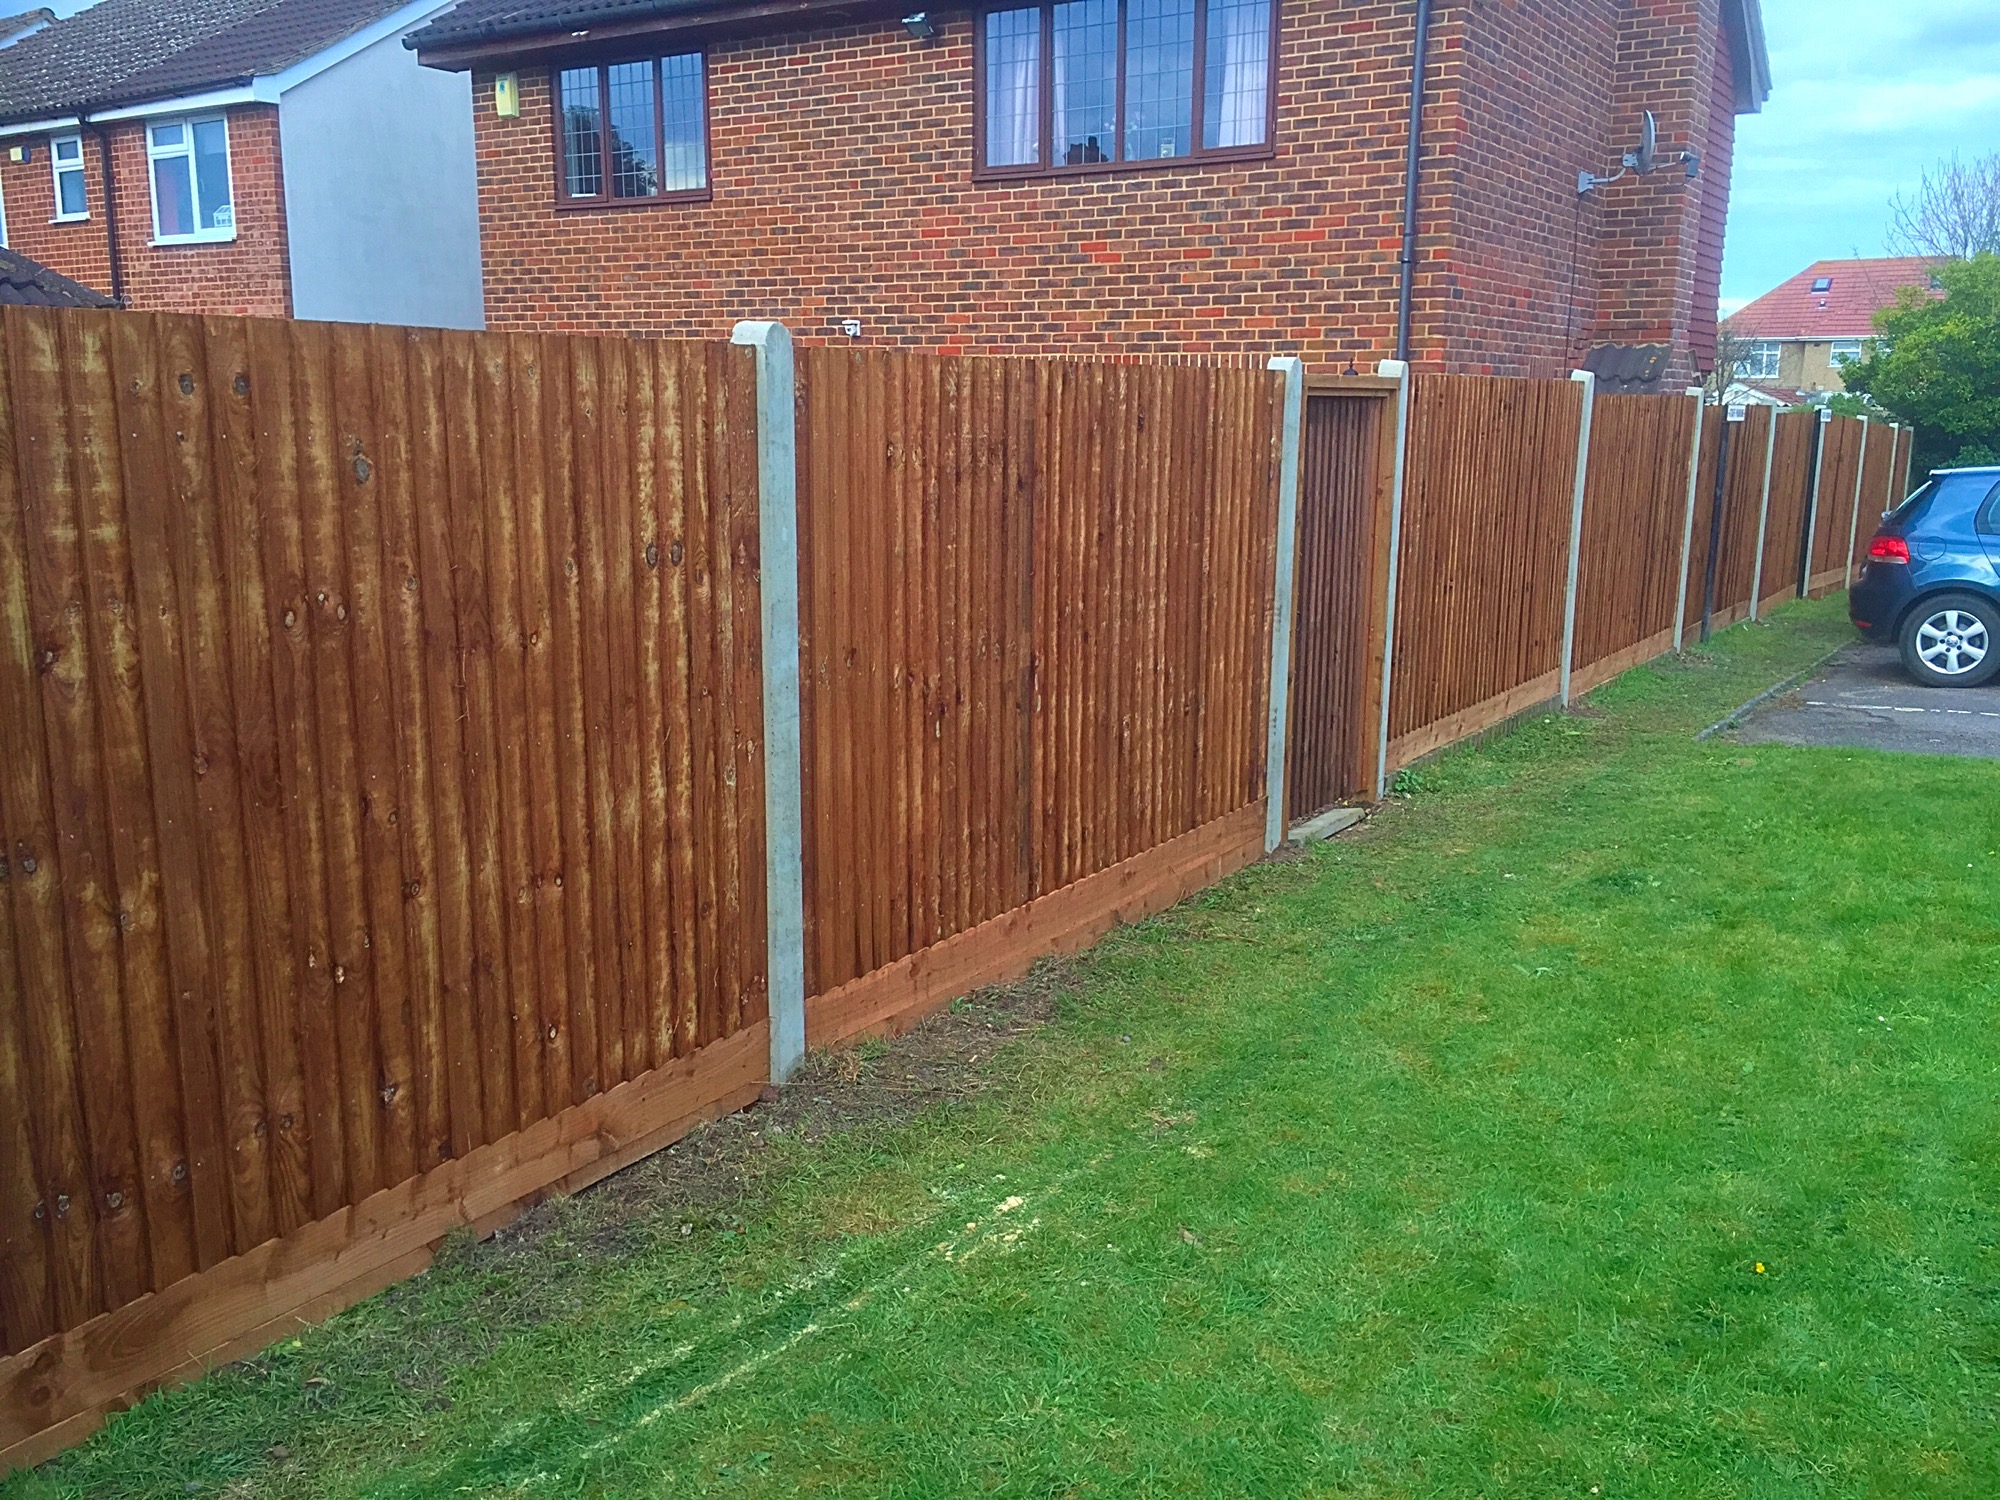 Quality garden fencing in Crayford.